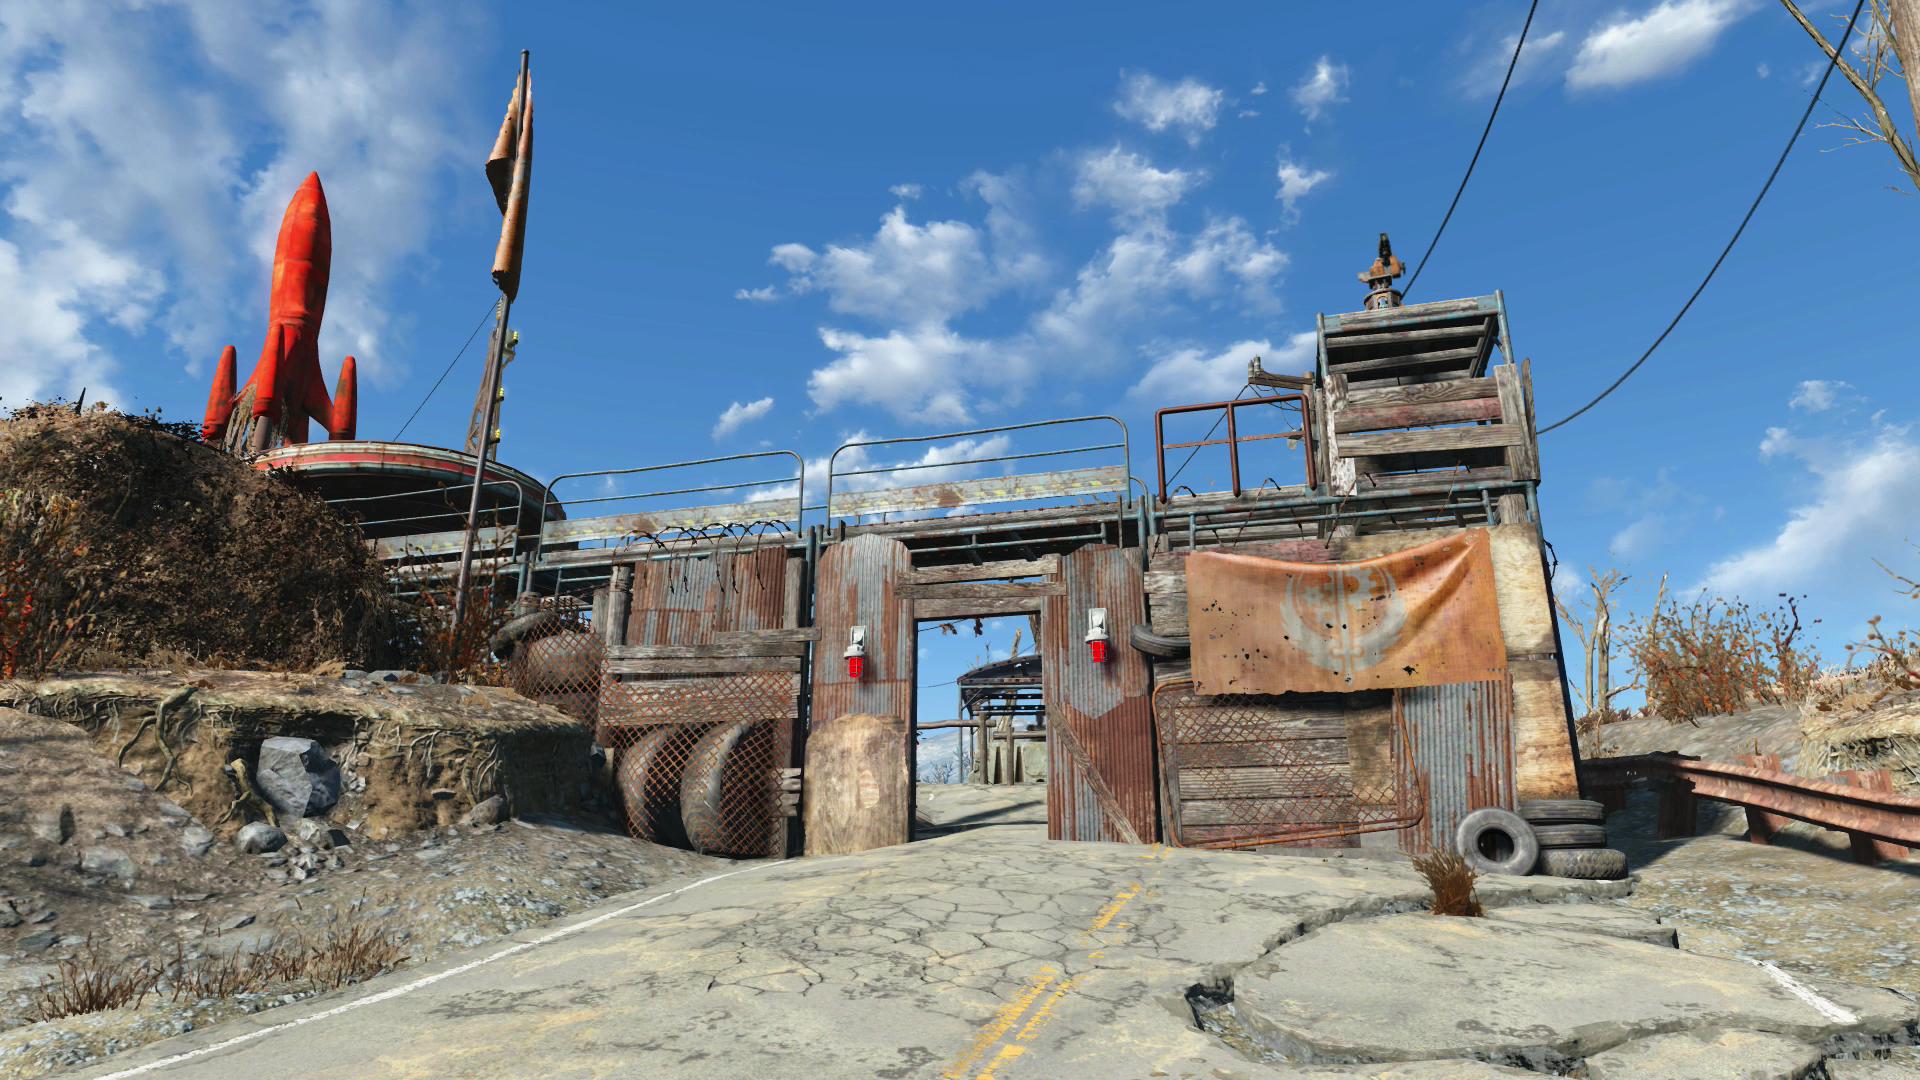 Lore-friendly] Red Rocket (Commonwealth) - megabuild